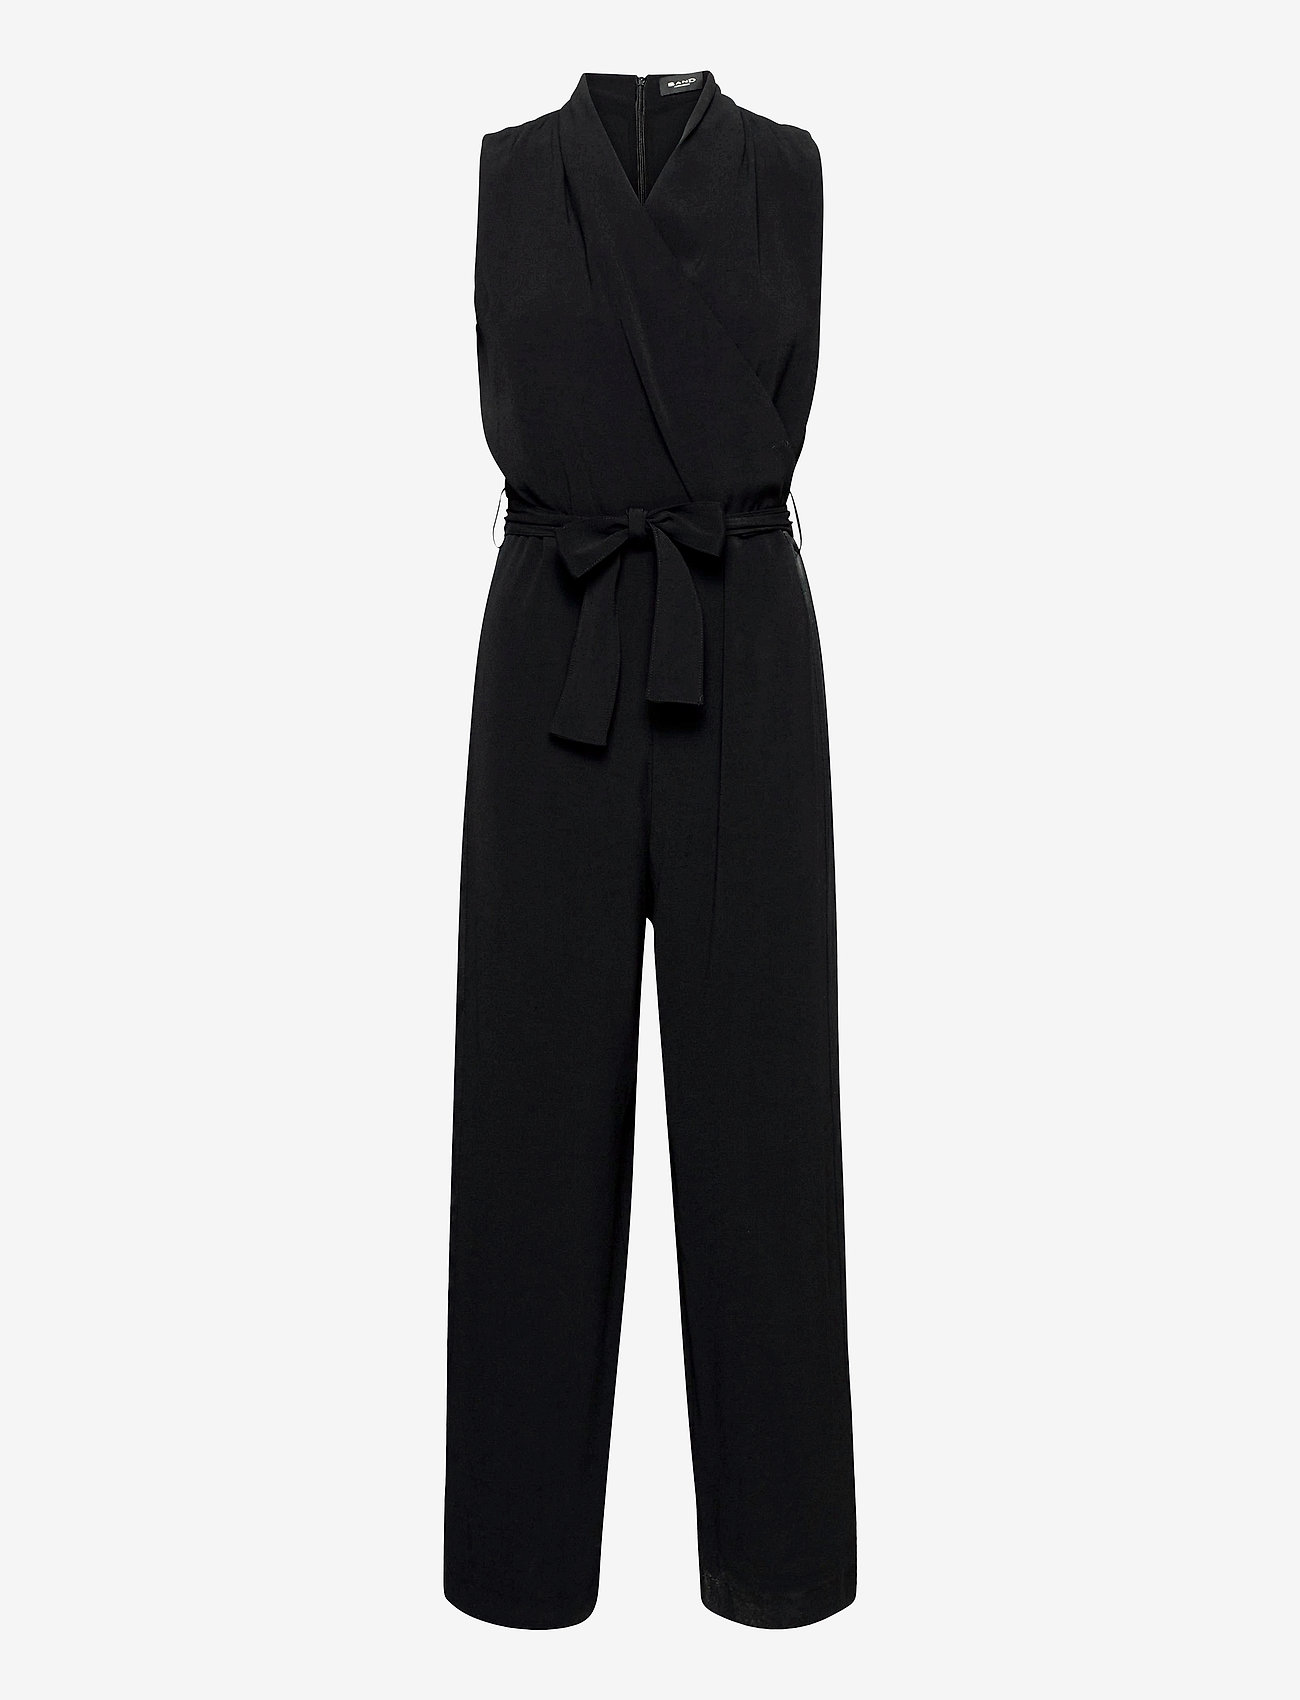 SAND - Crepe Satin Back - Whitney NT - jumpsuits - black - 0